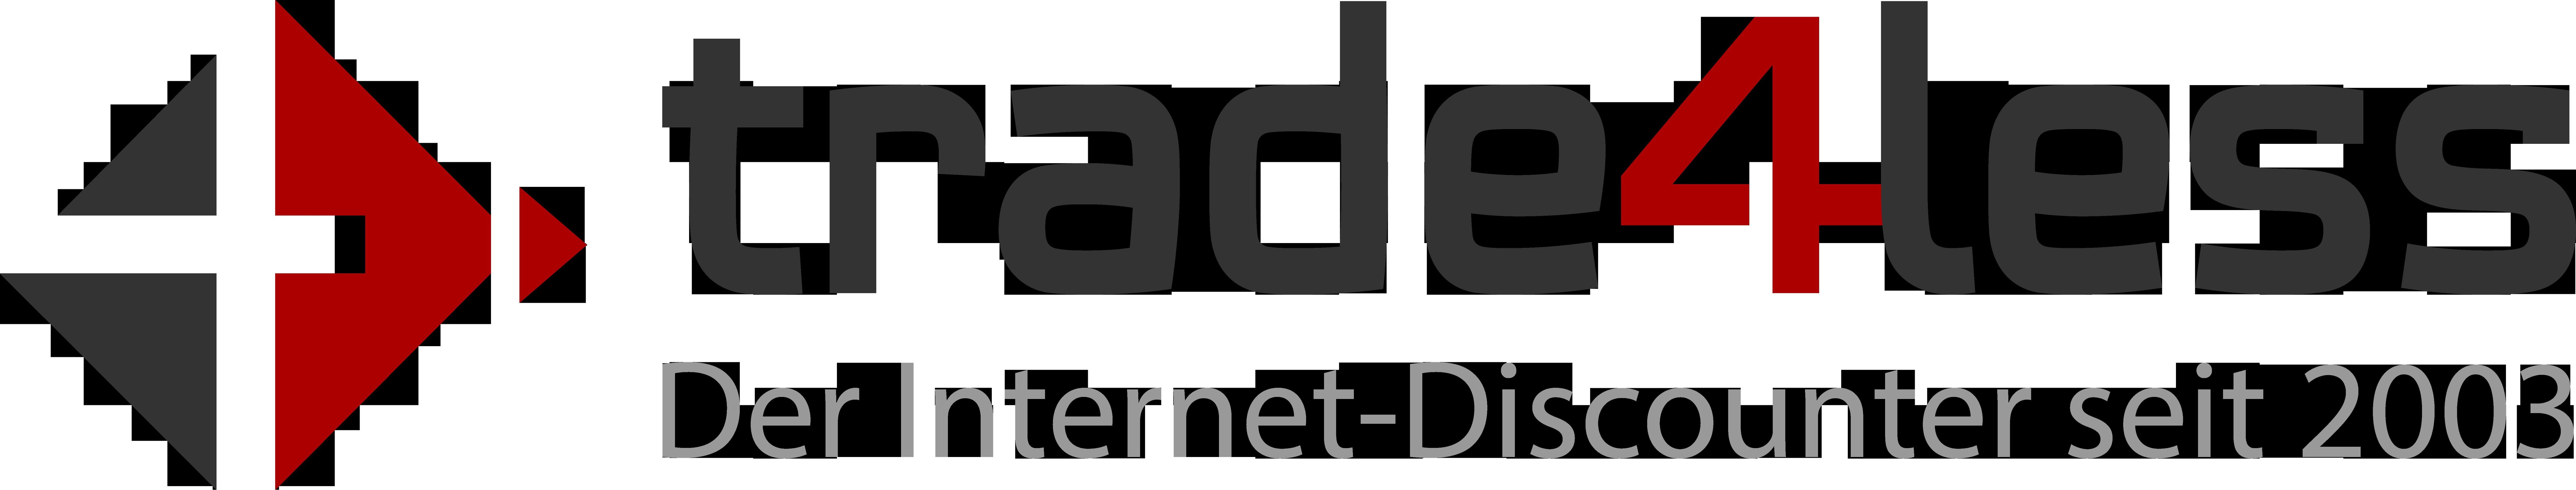 trade4less.net